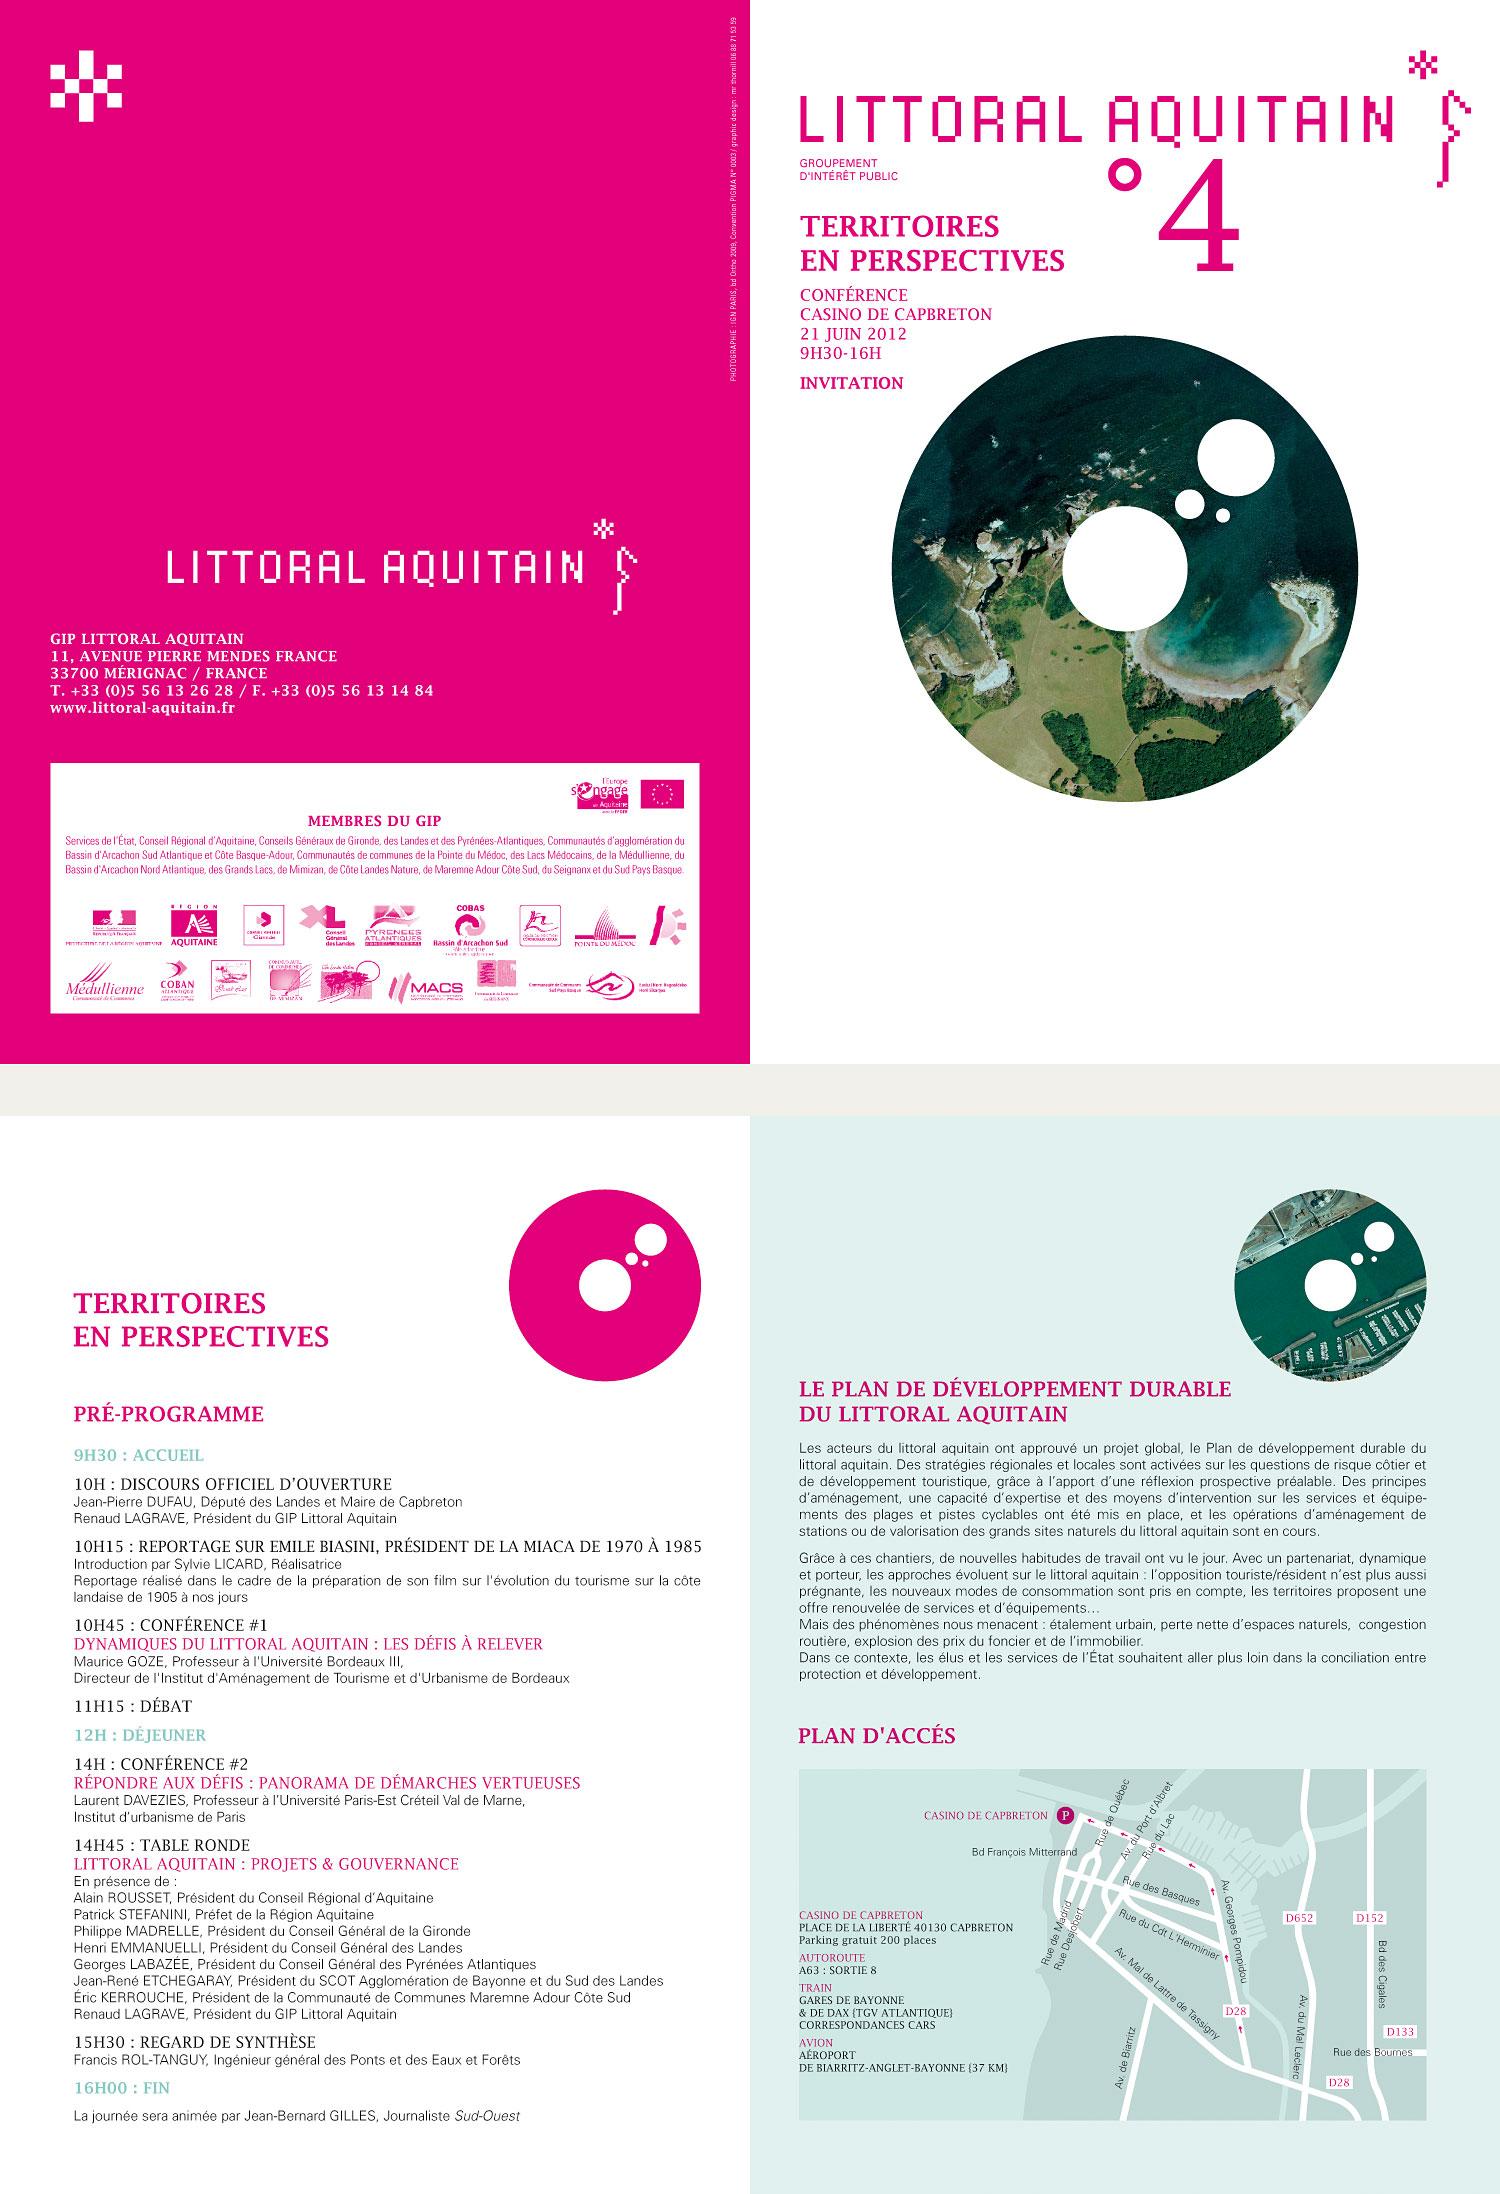 MrThornill-graphisme-gip-littoral-aquitain-identite-visuelle-ph3